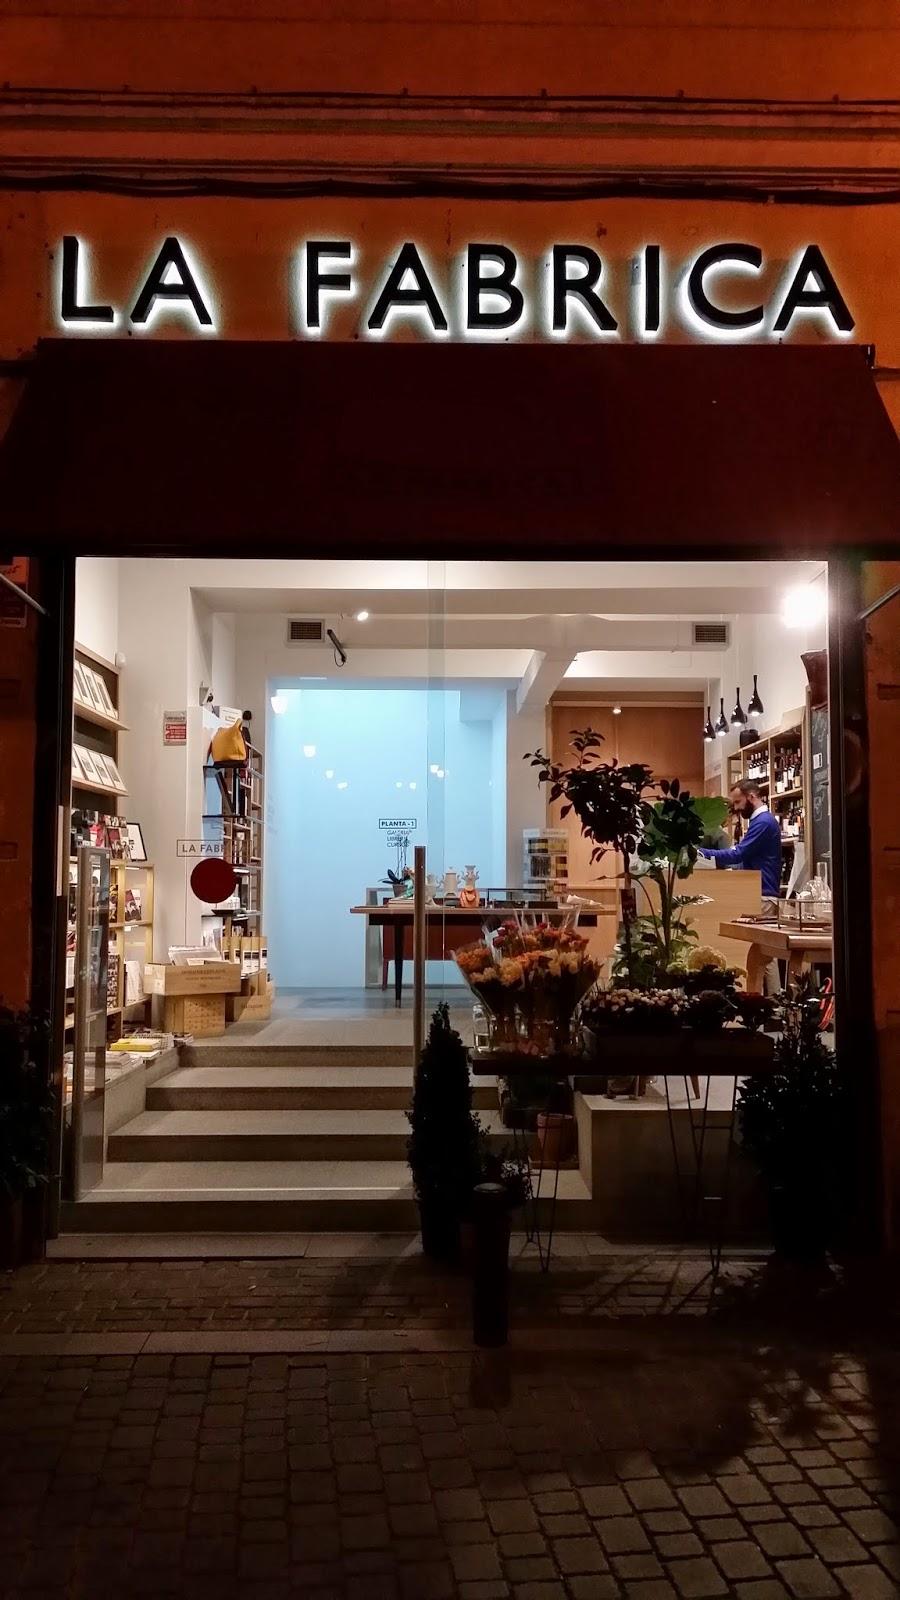 La Fabrica, Juan Gatti, Presentación colección pañuelos, complementos, moda